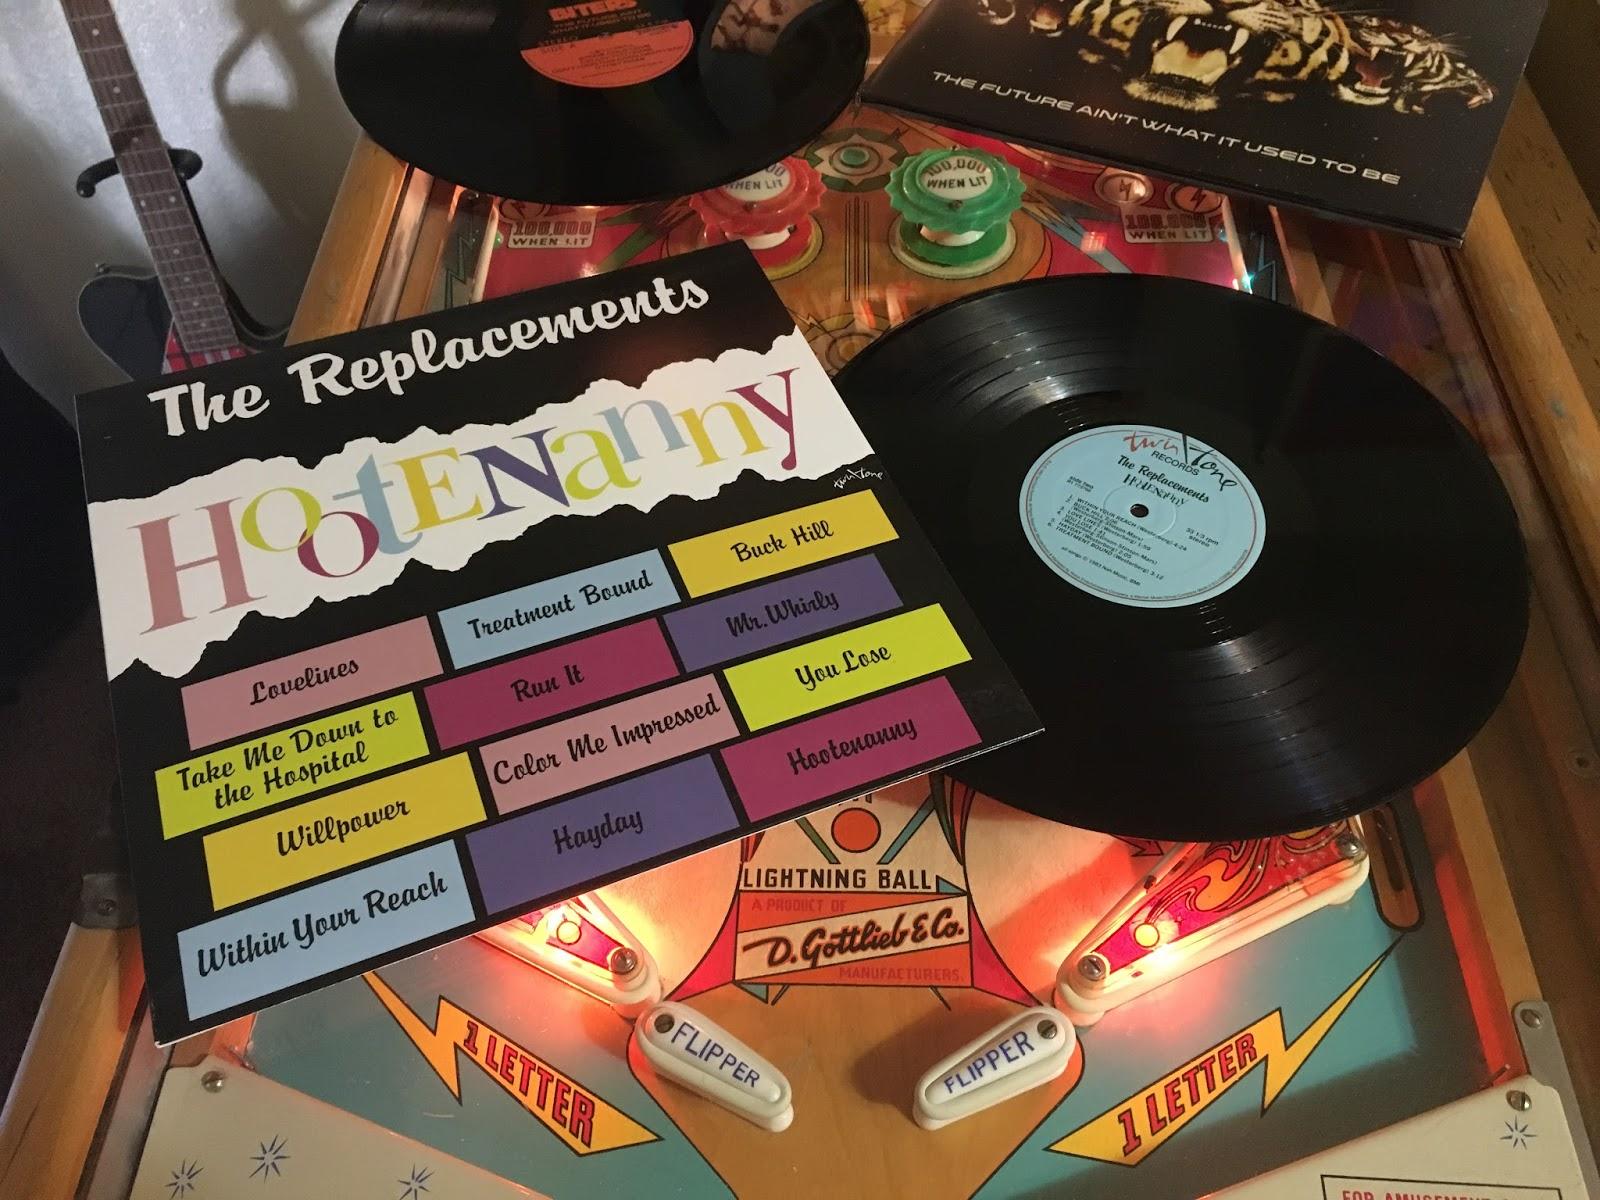 Real Punk Radio - 247 Streaming Punk Rocknroll -1702